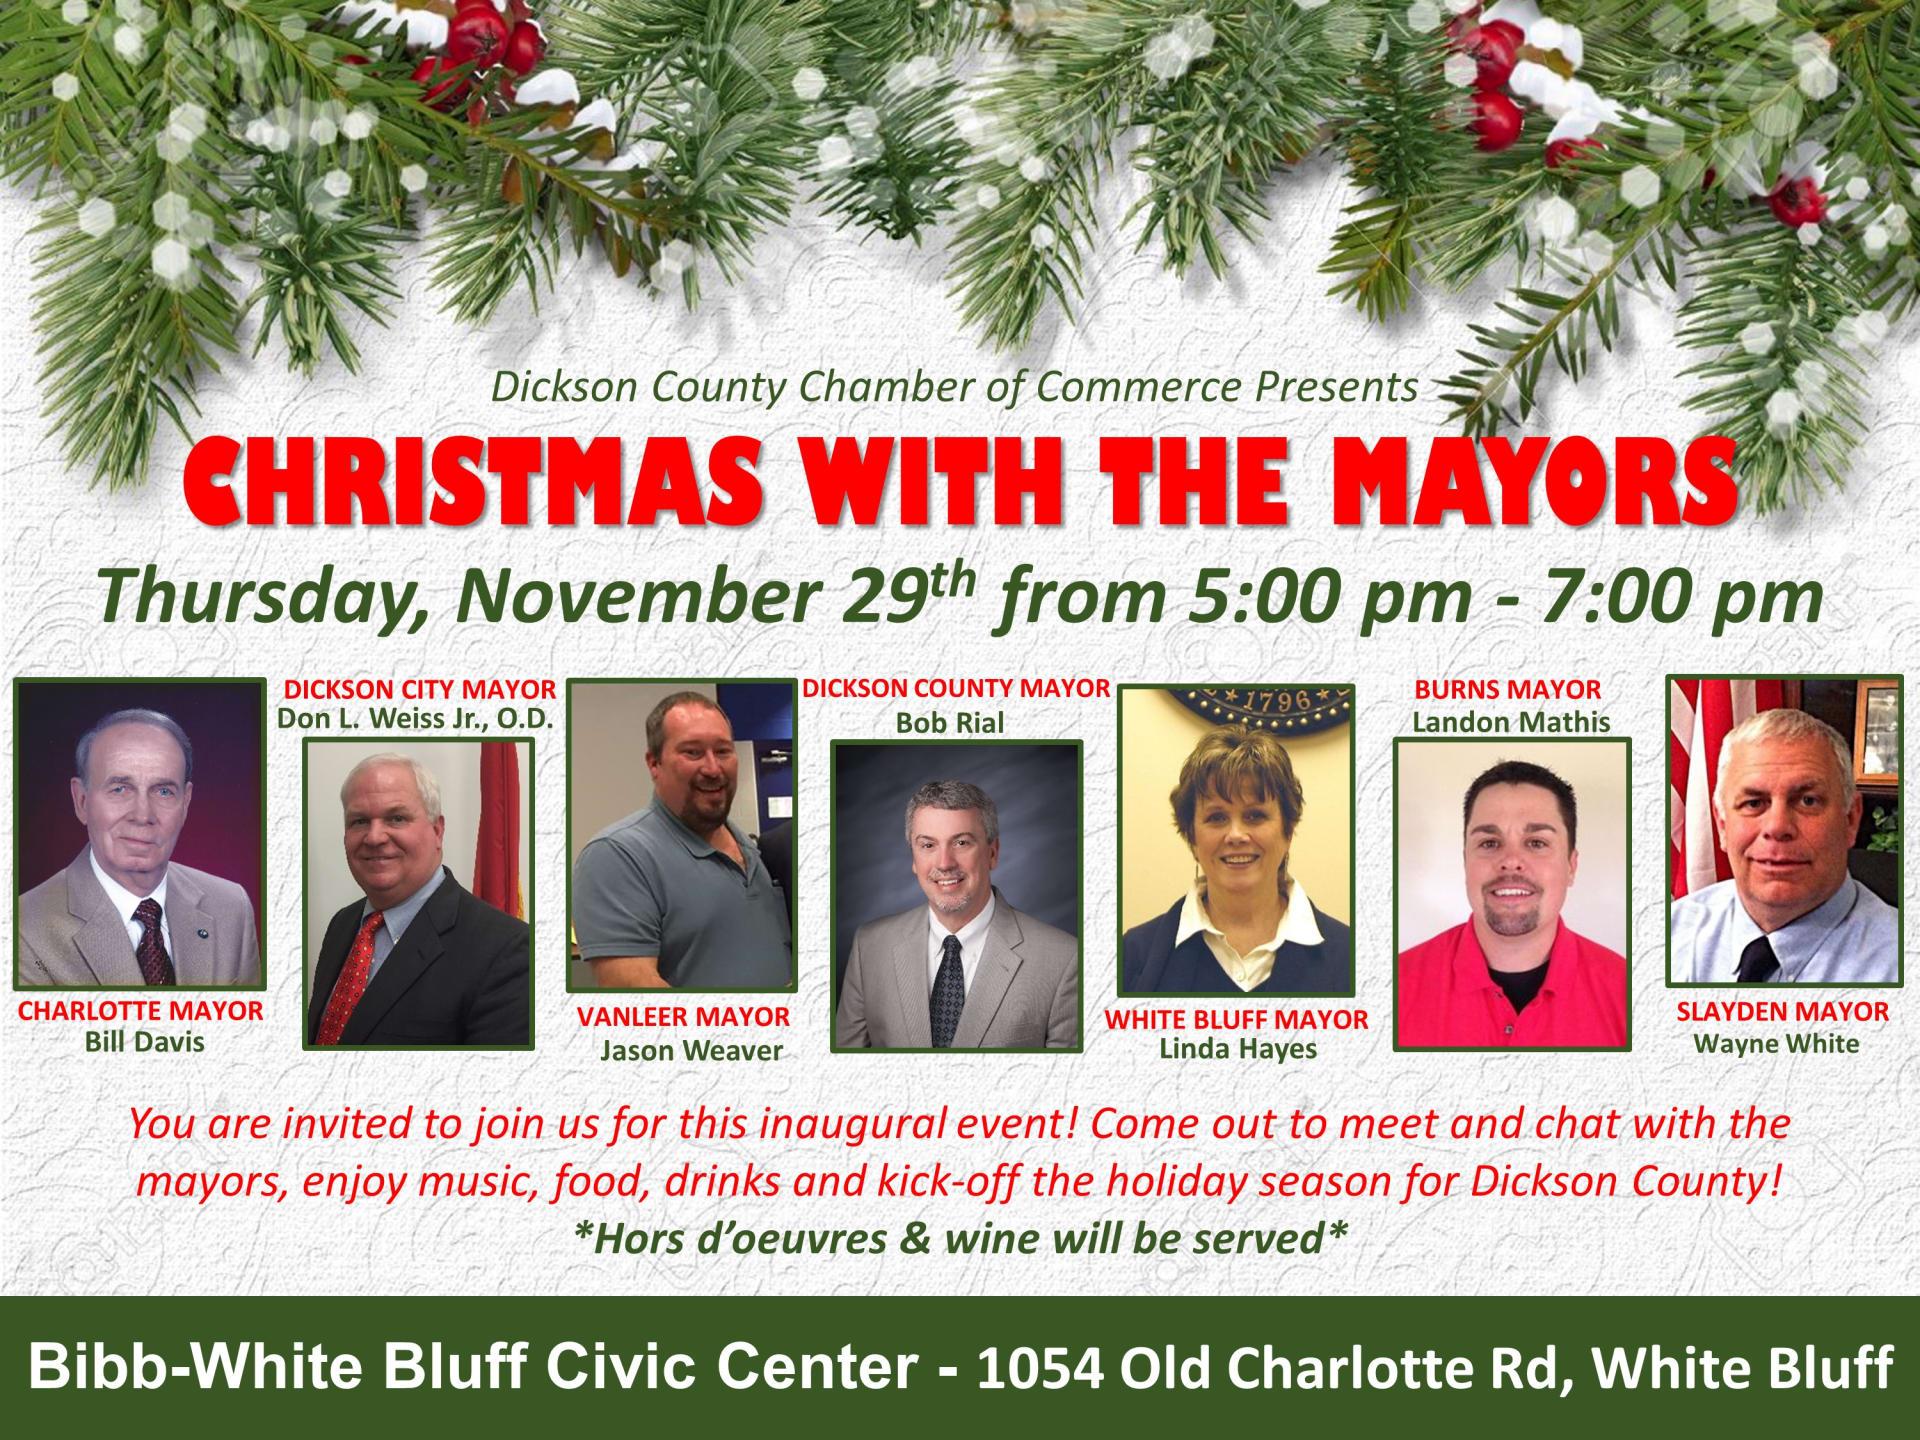 Christmas-with-the-Mayors-Dickson County